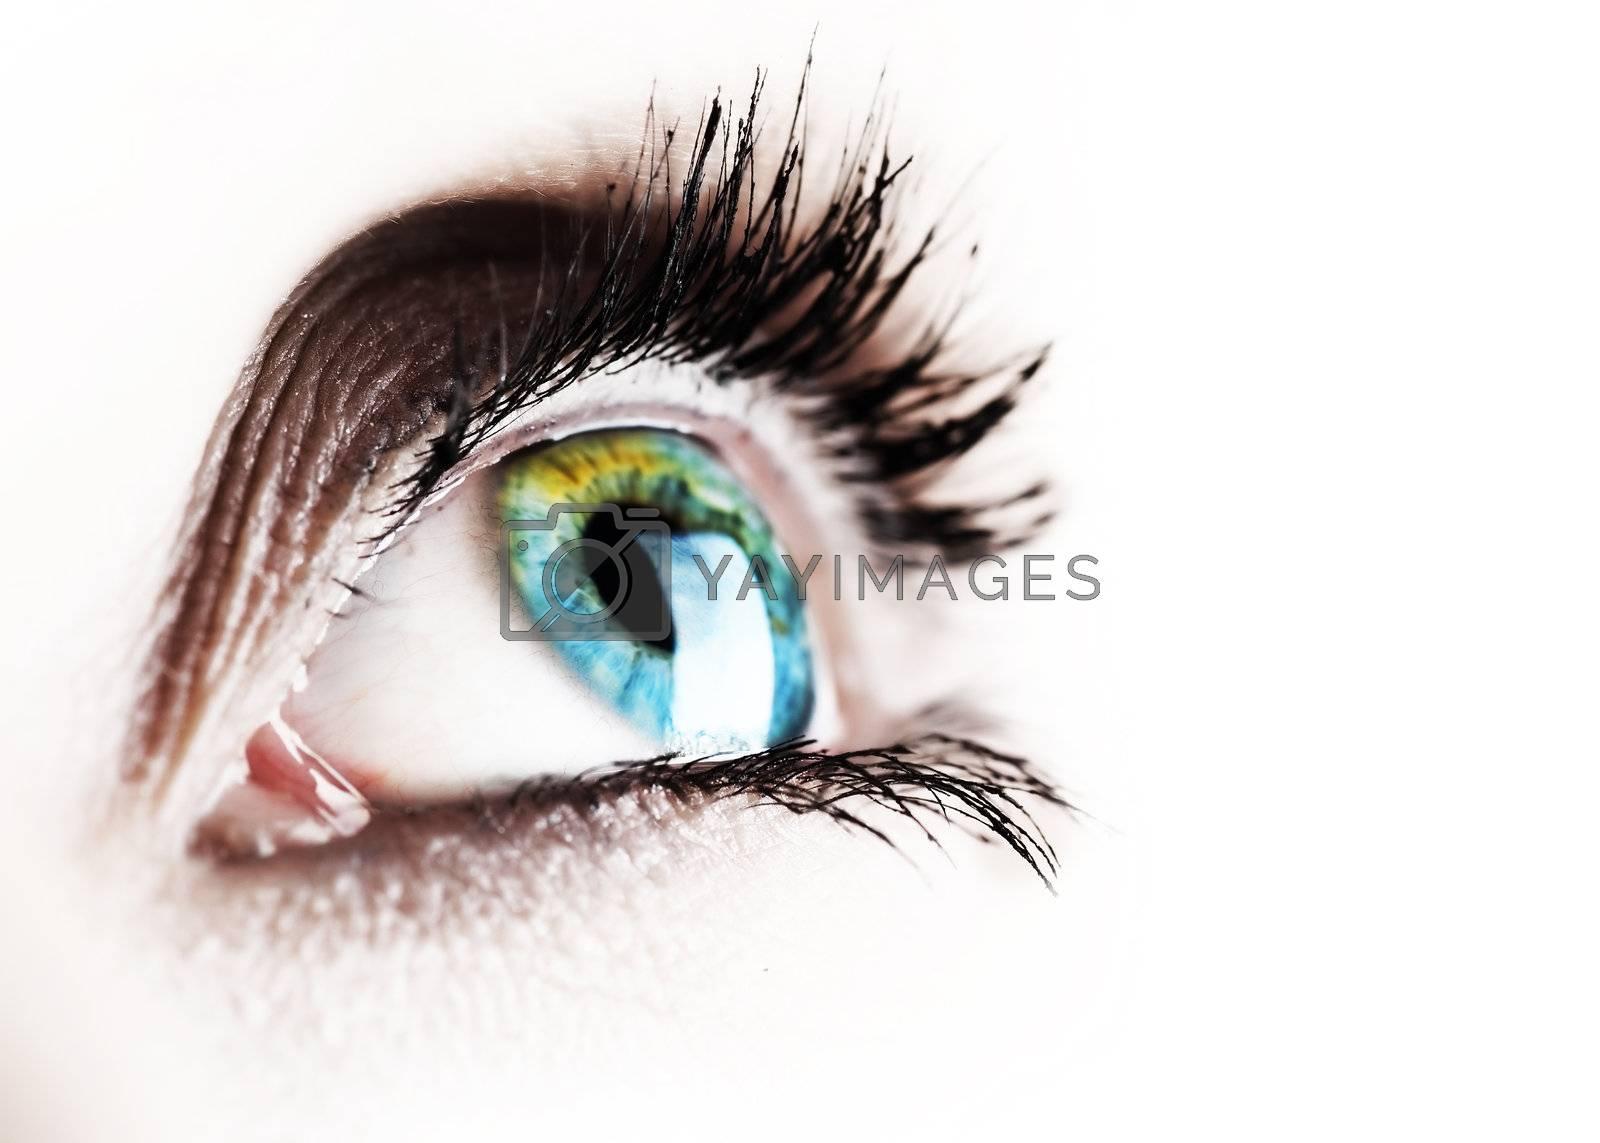 Beautiful Eye Isolated On White by Subbotina Anna